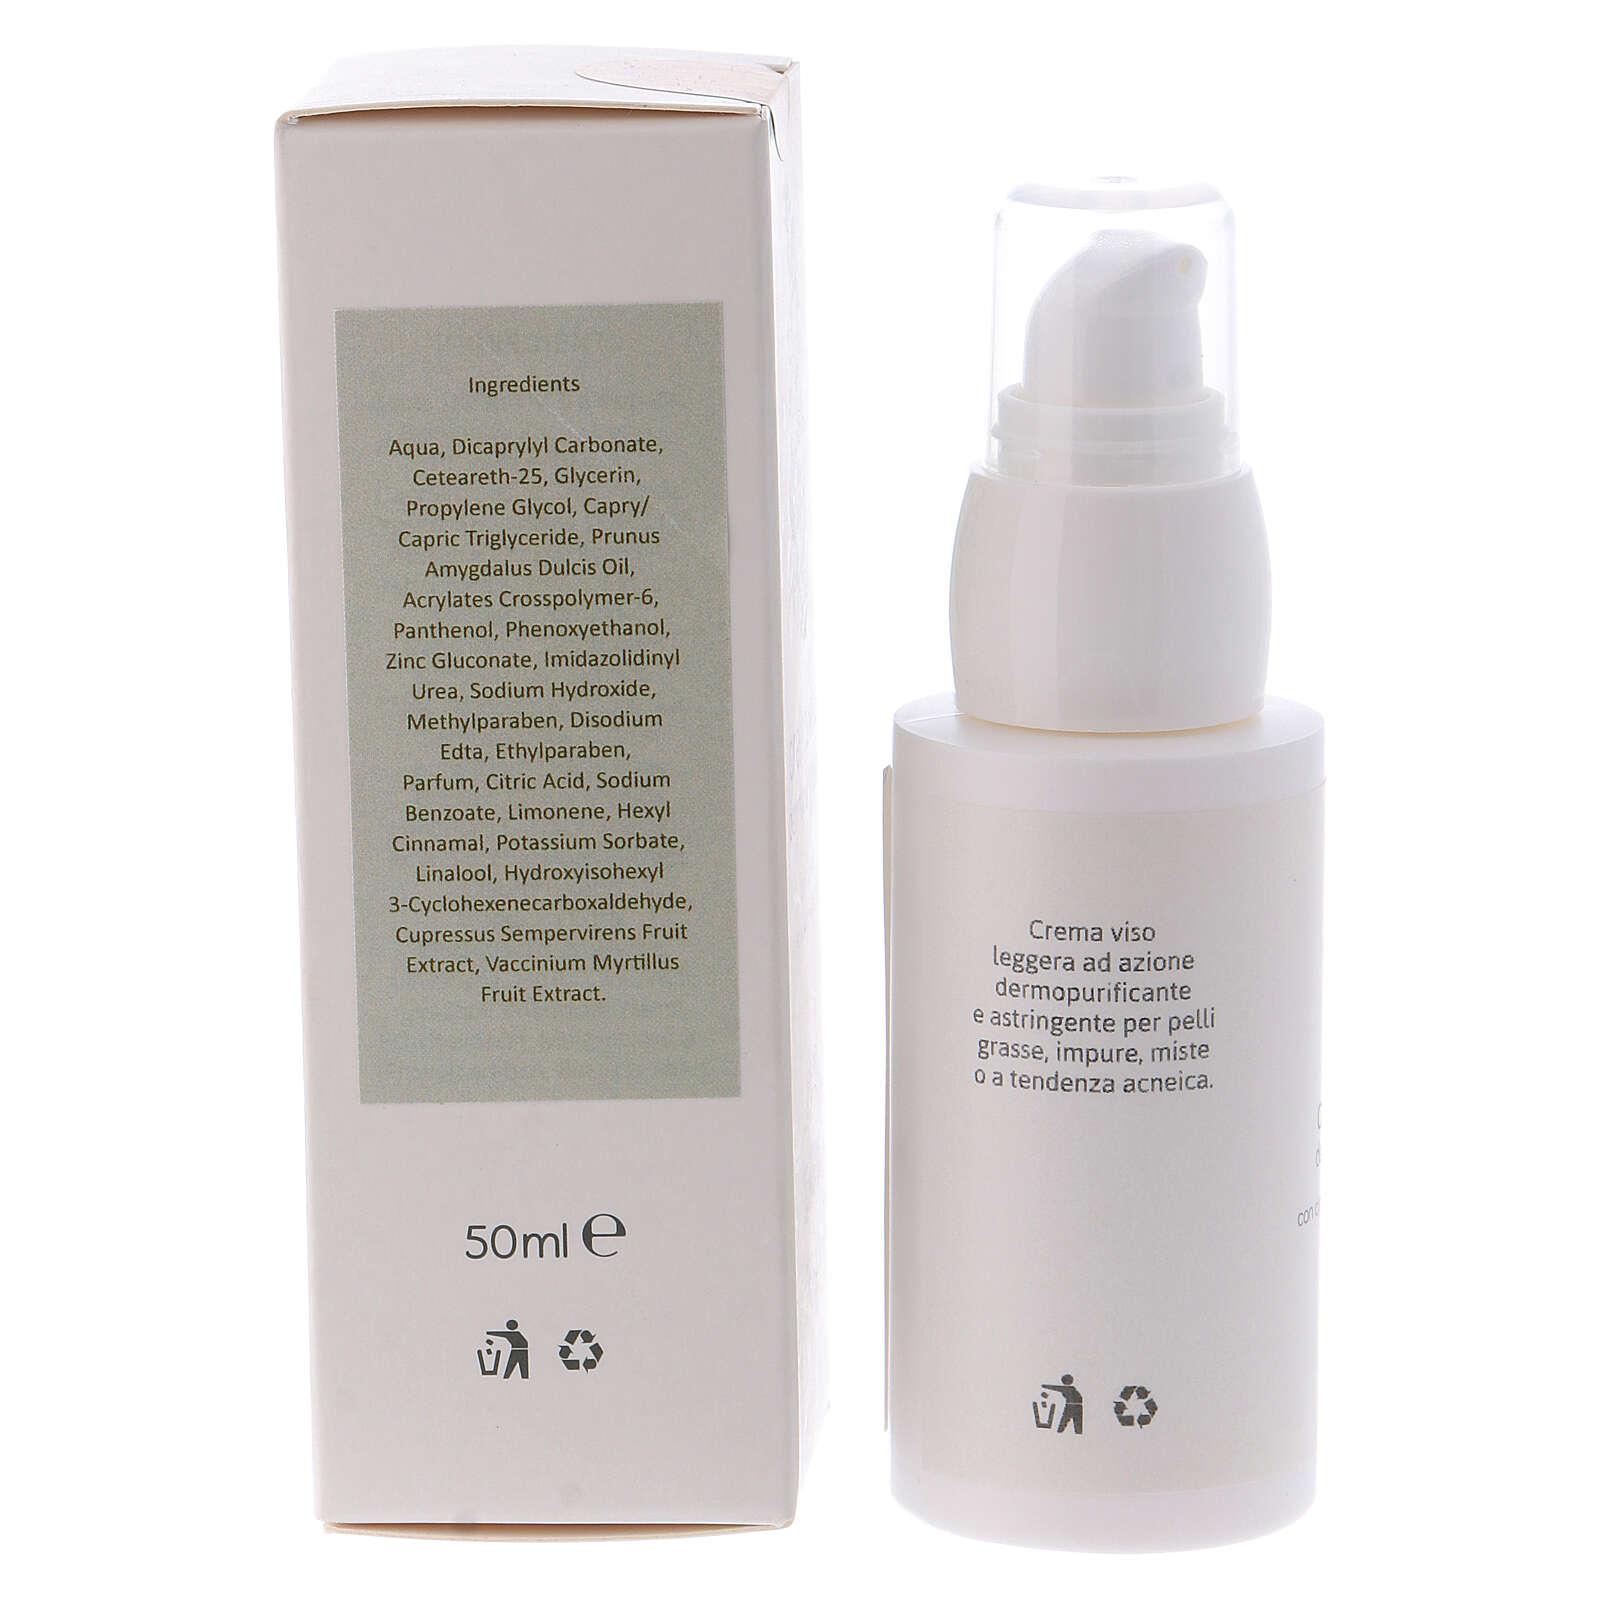 Creme de rosto purificador 50 ml Valserena 4